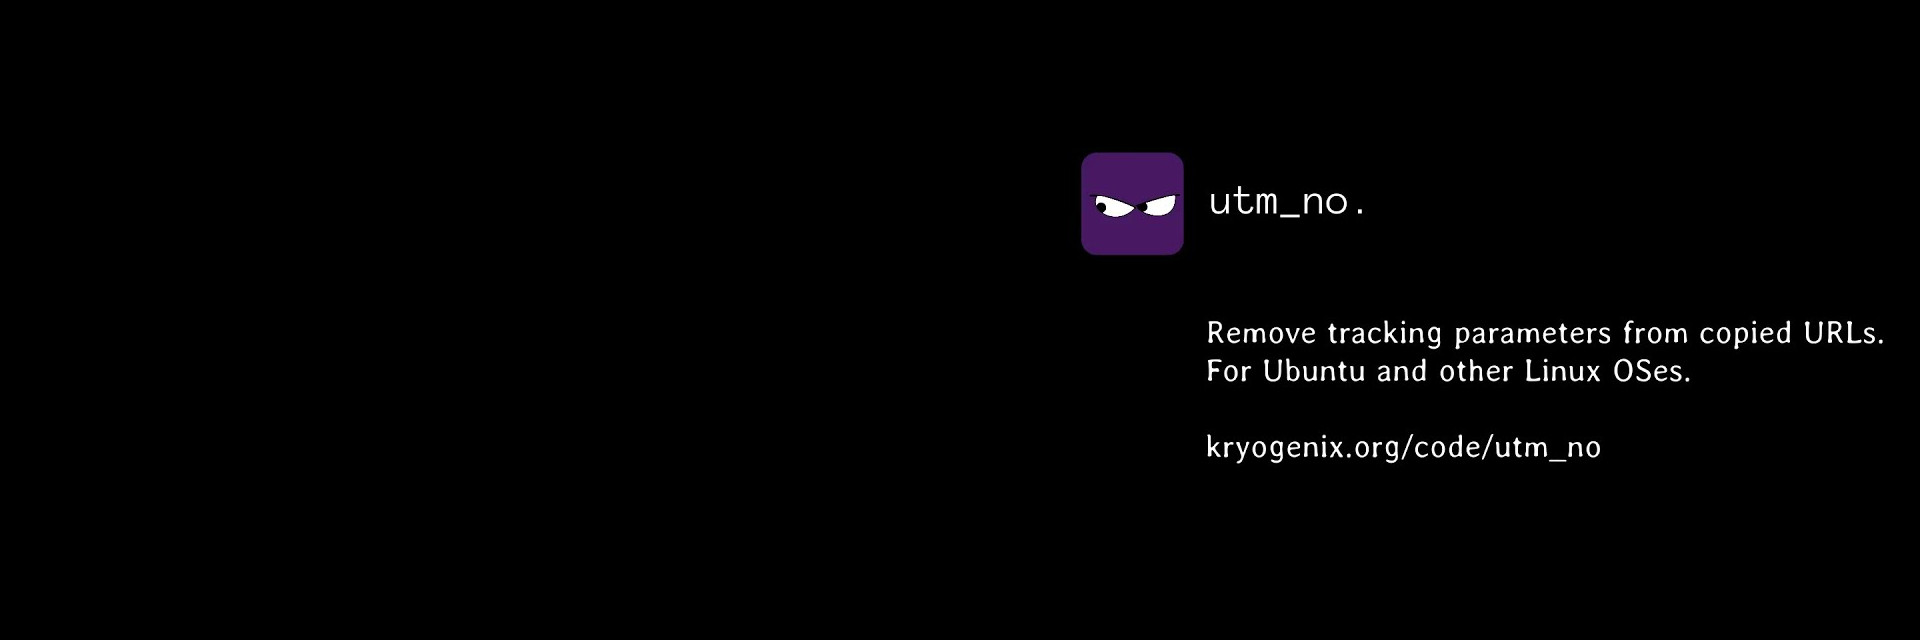 utm-no banner